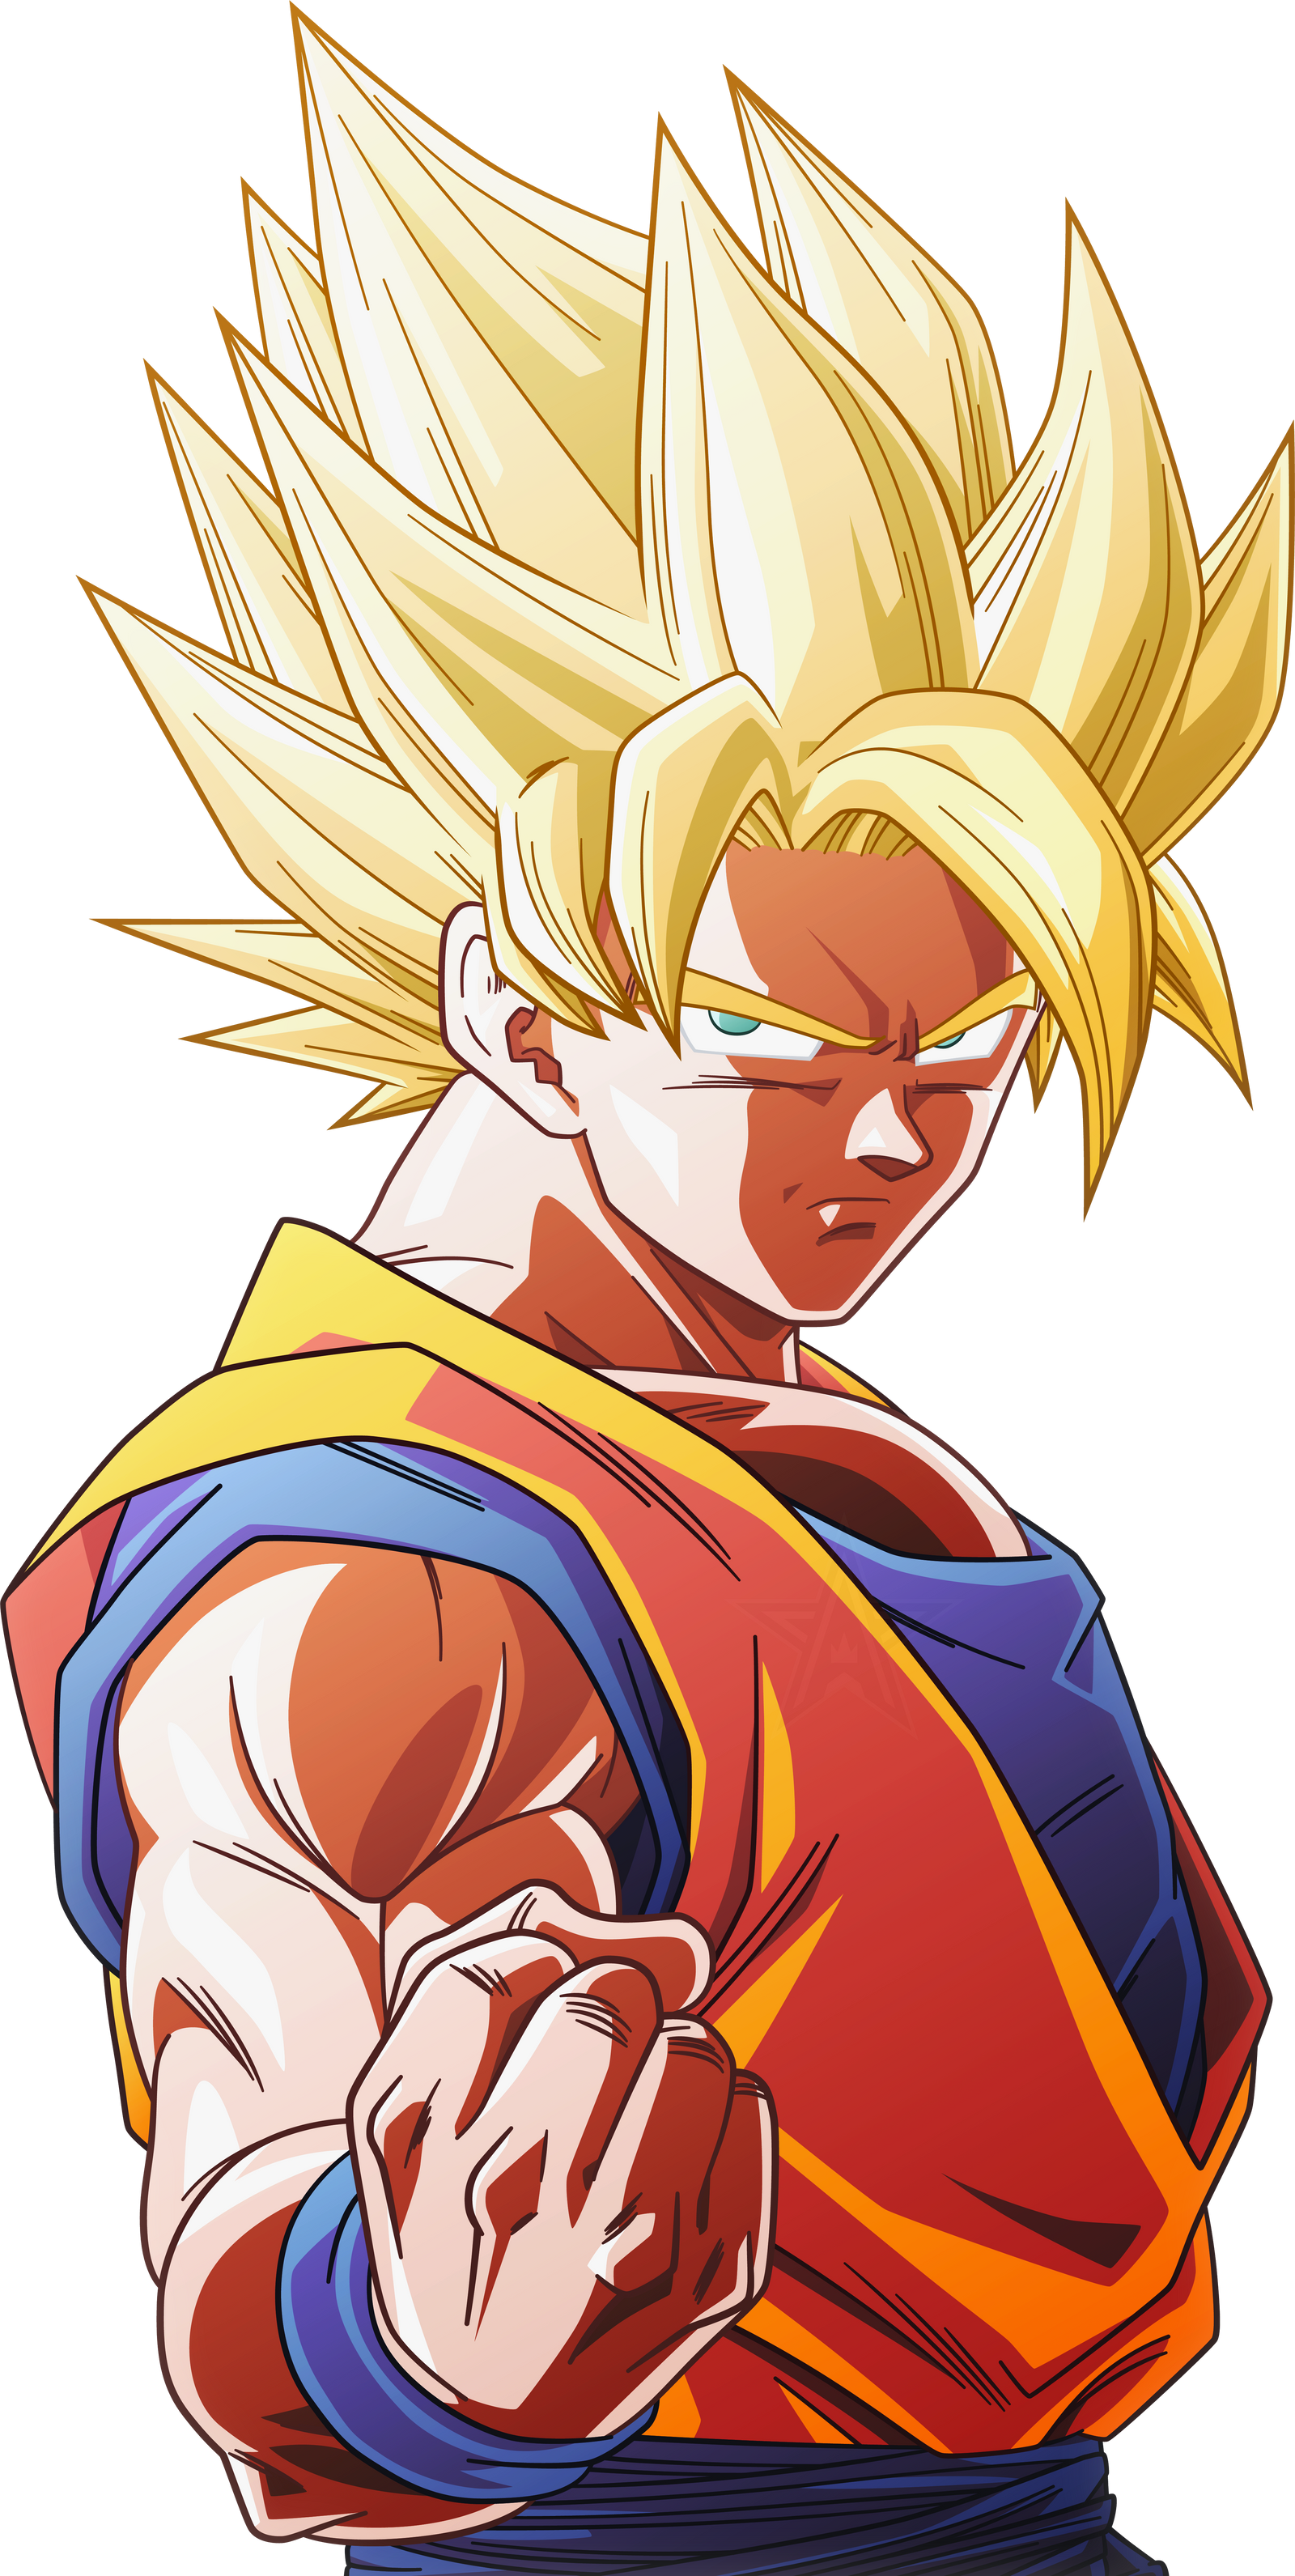 Super Saiyan Goku 8 Alt 2 By Aubreiprince On Deviantart